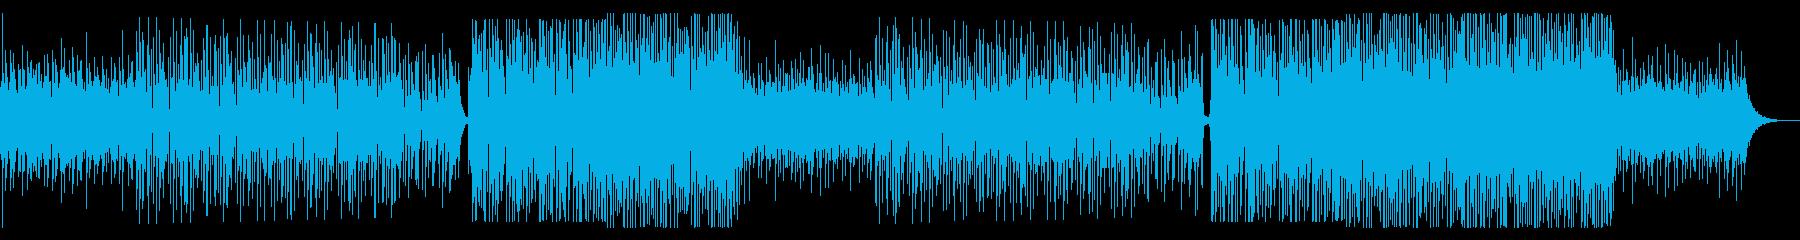 Ala Moana ExVoの再生済みの波形